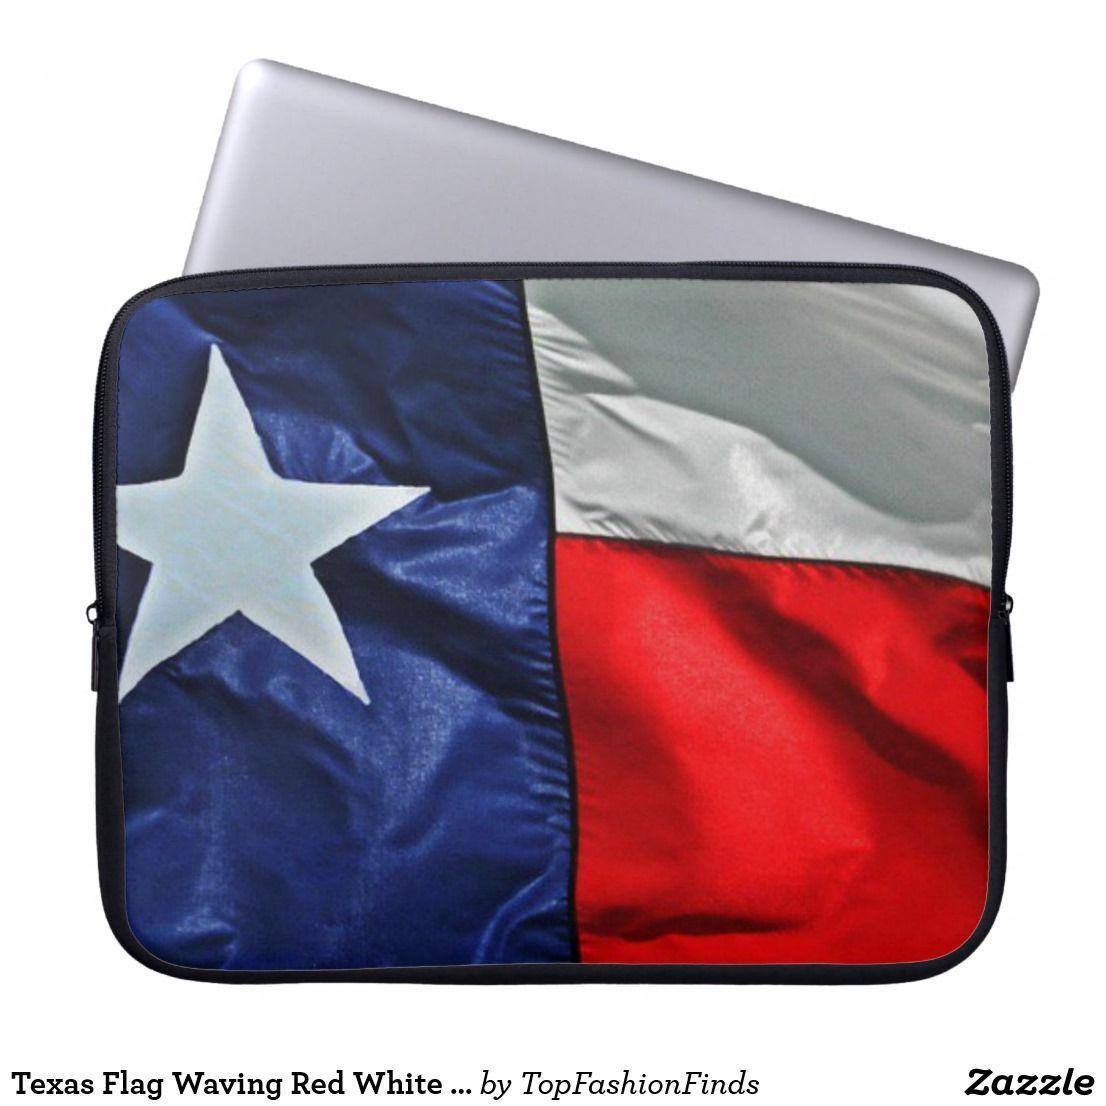 Texas Flag Waving Red White And Blue Laptop Sleeve Zazzle Com Laptop Sleeves Computer Sleeve Custom Laptop